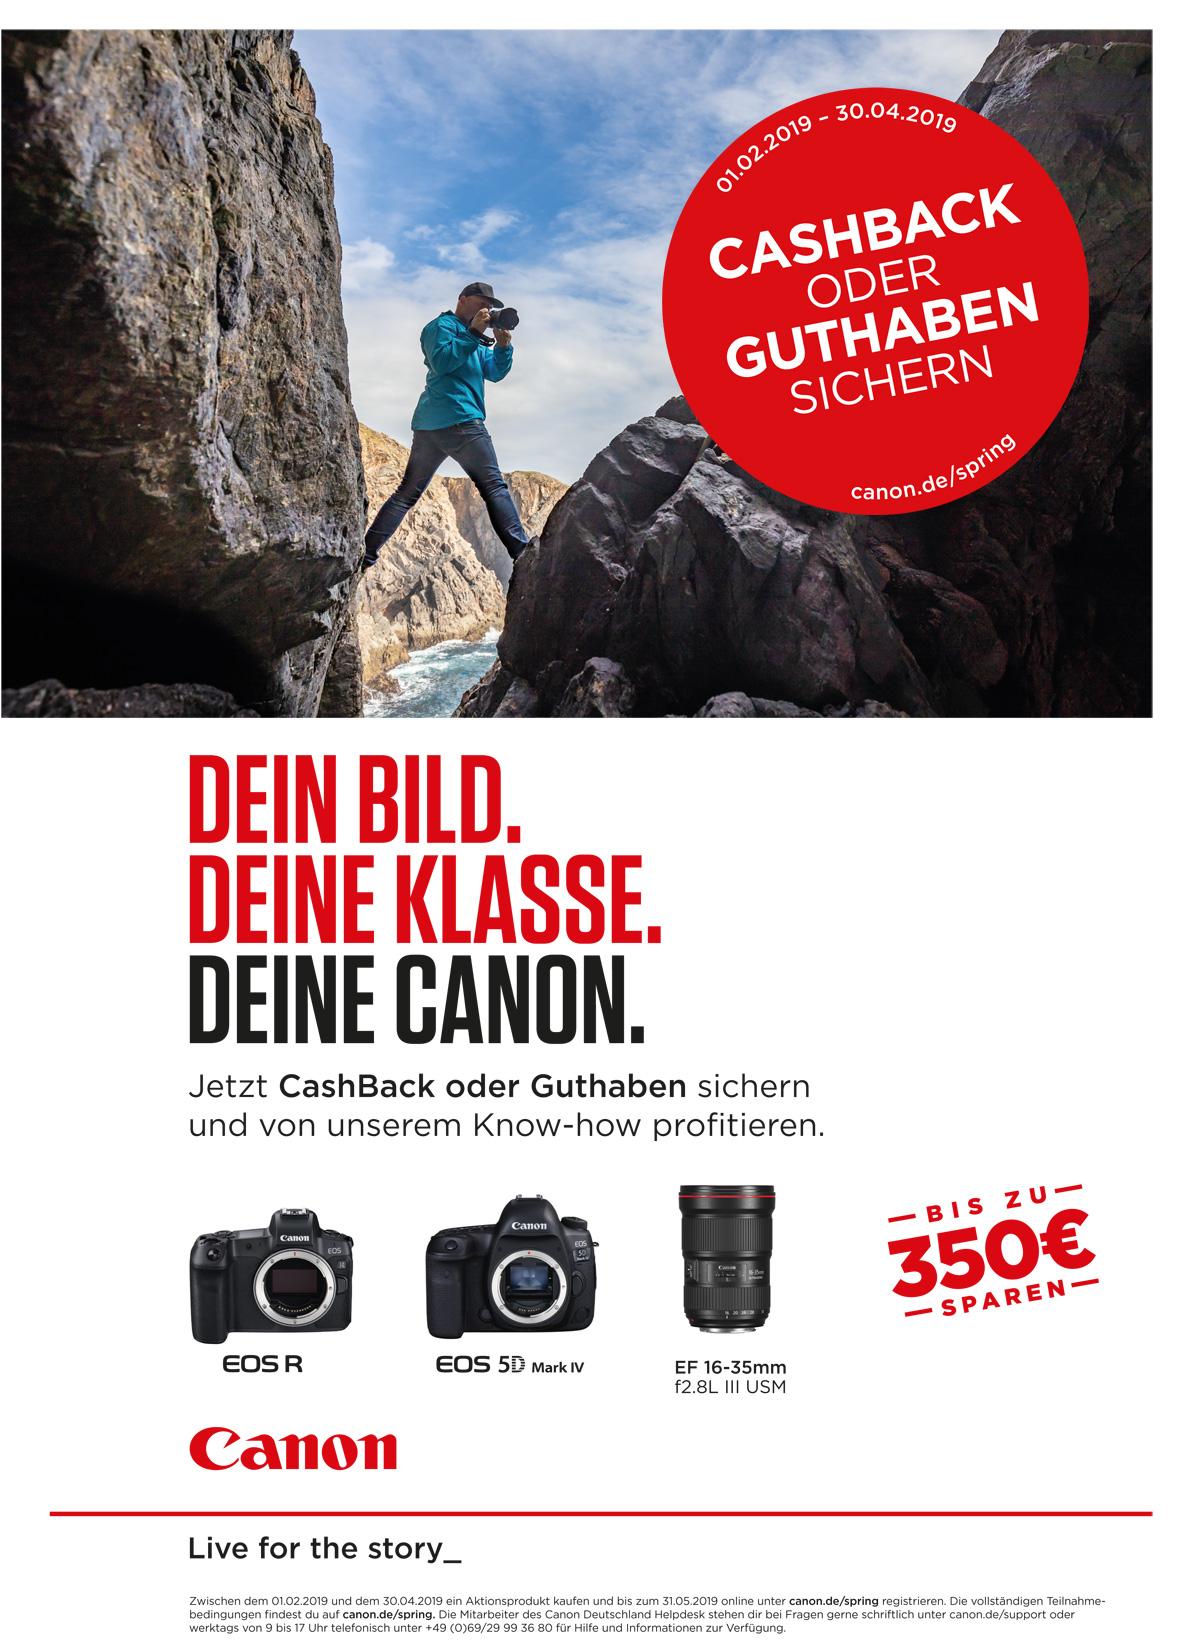 Canon Frühjahrspromotion